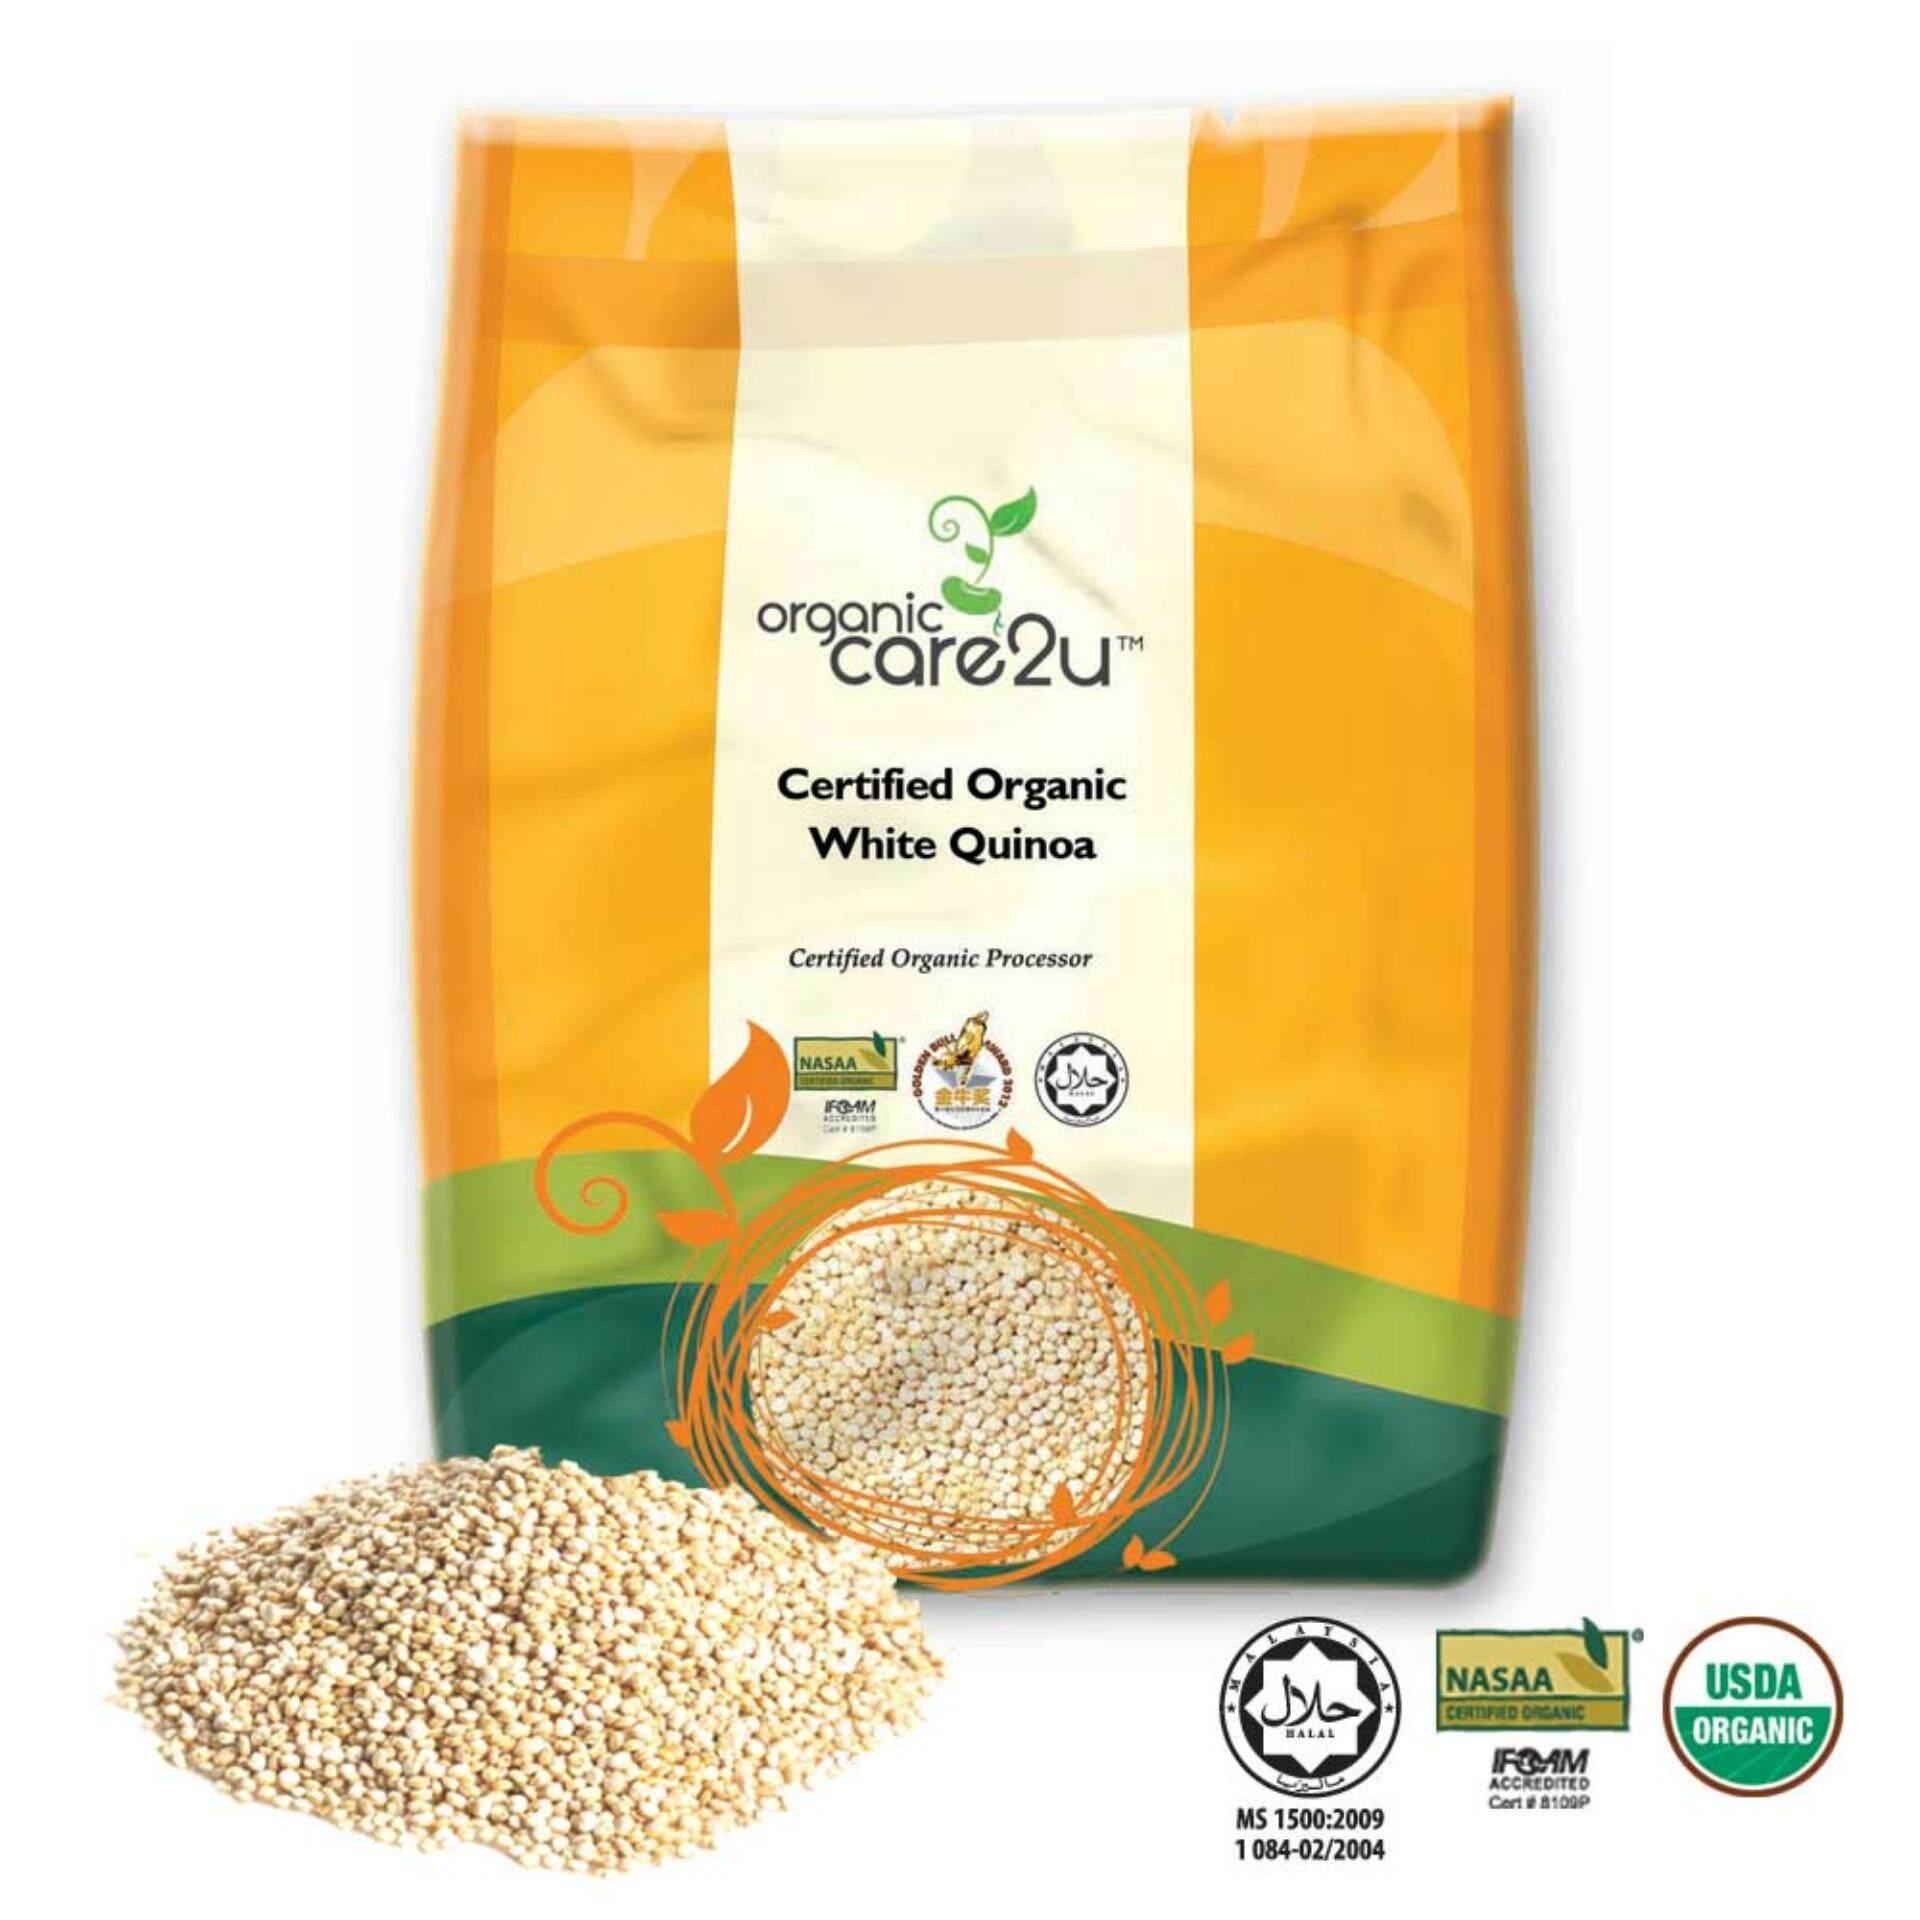 Organic Care2u Organic White Quinoa (400g)